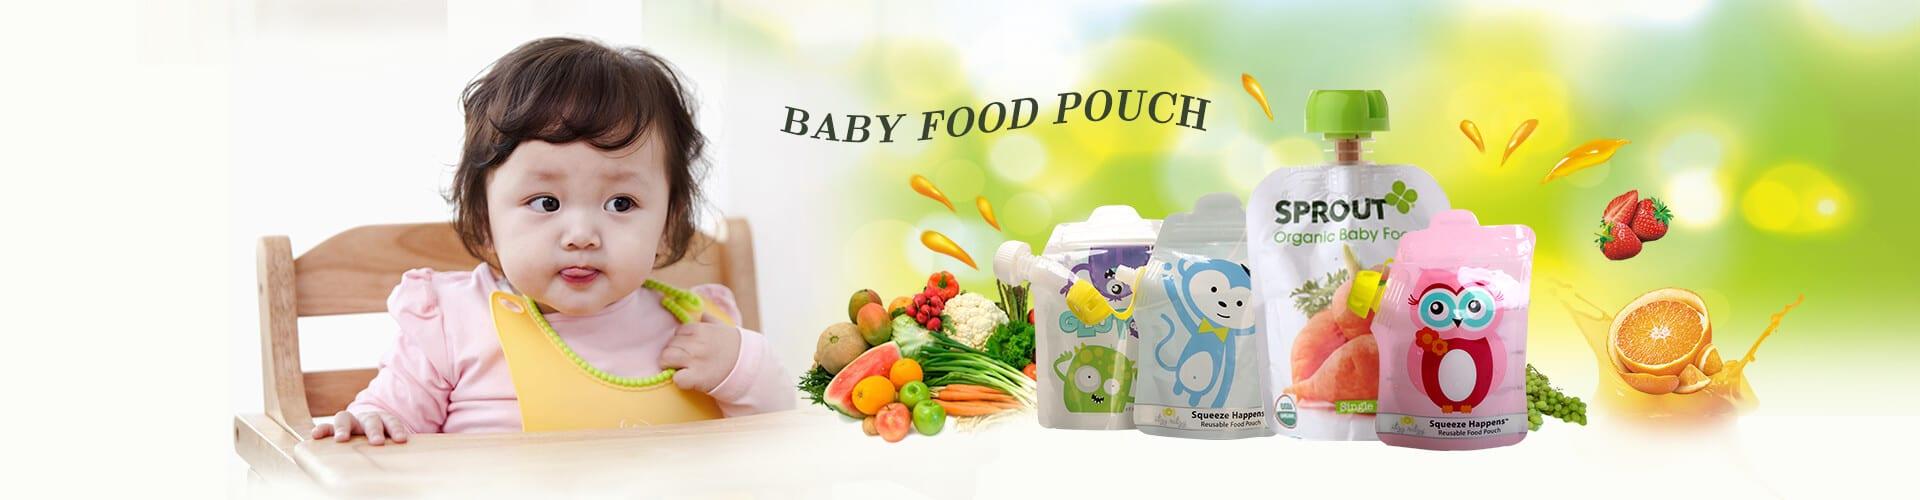 baby spout pouches